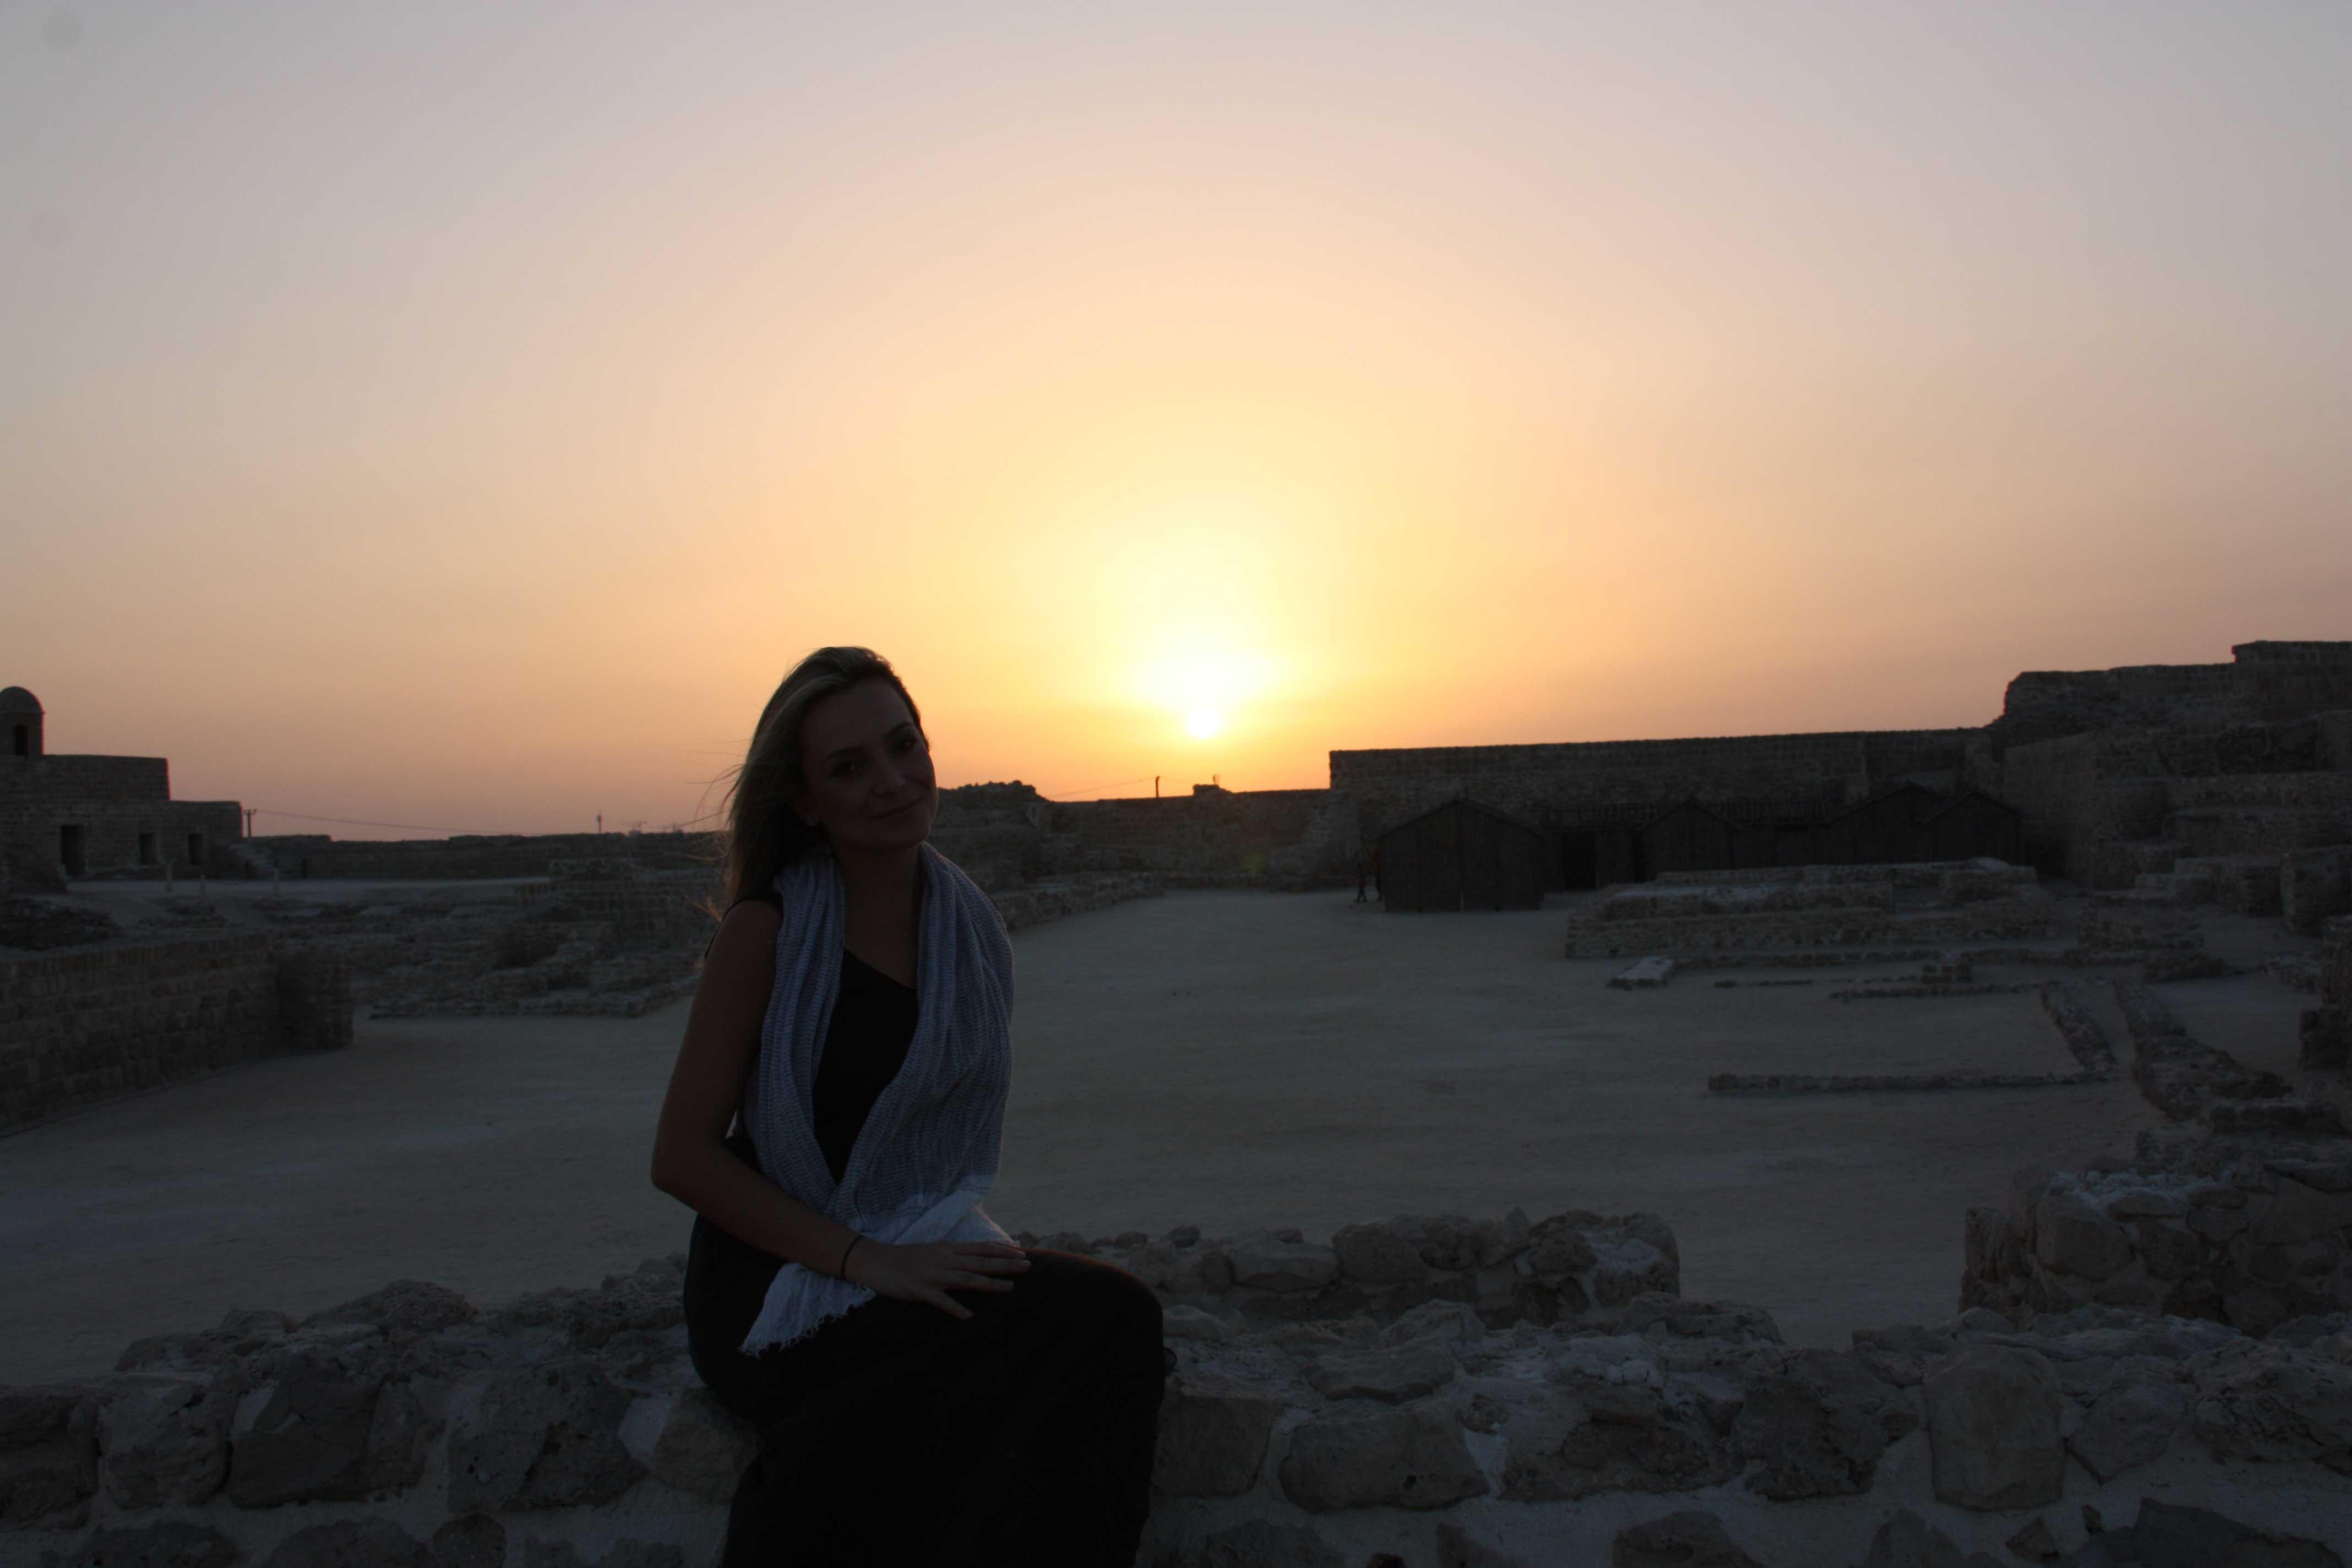 forte-bahrain]-063